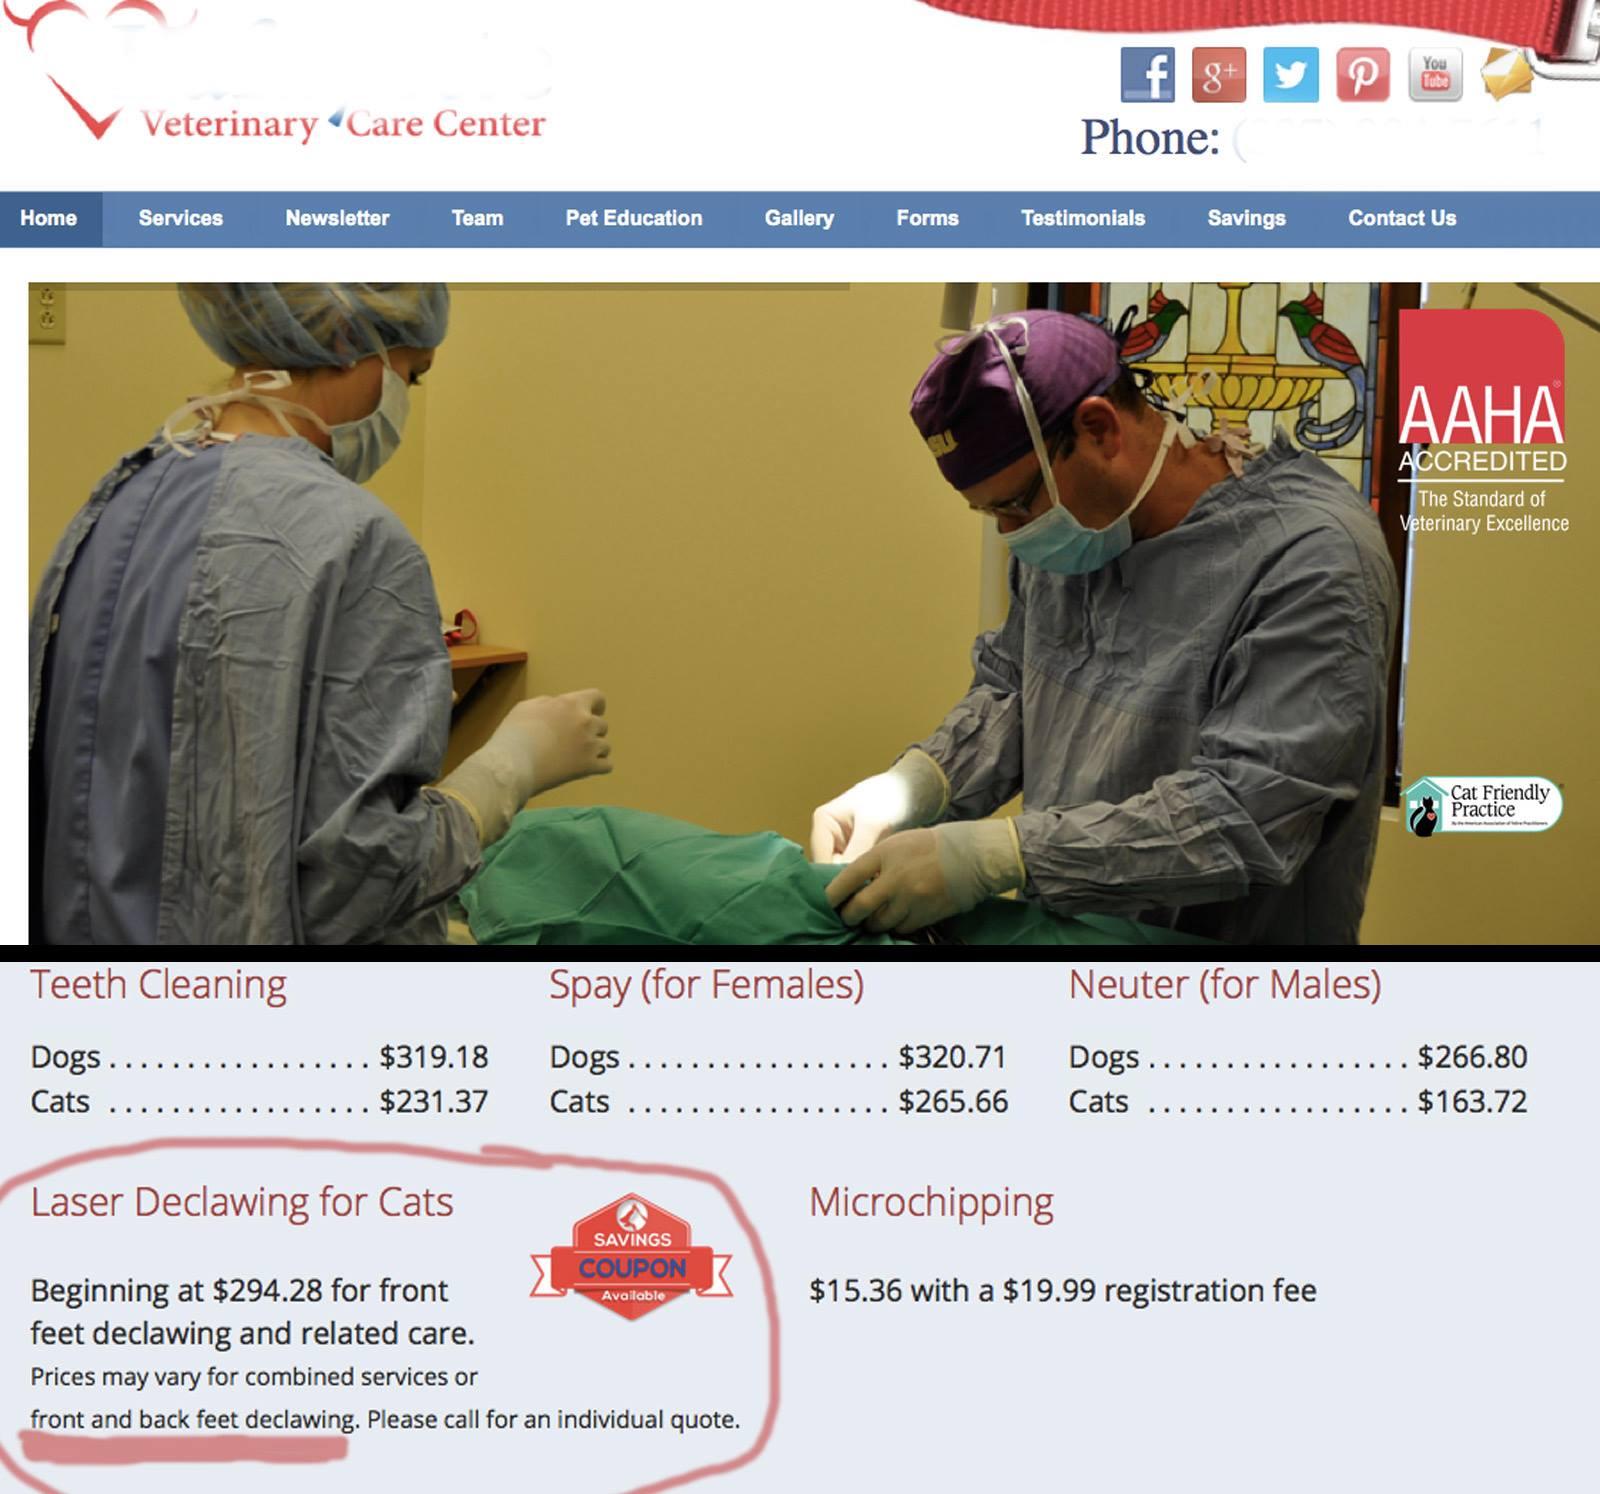 AAHA vet care center